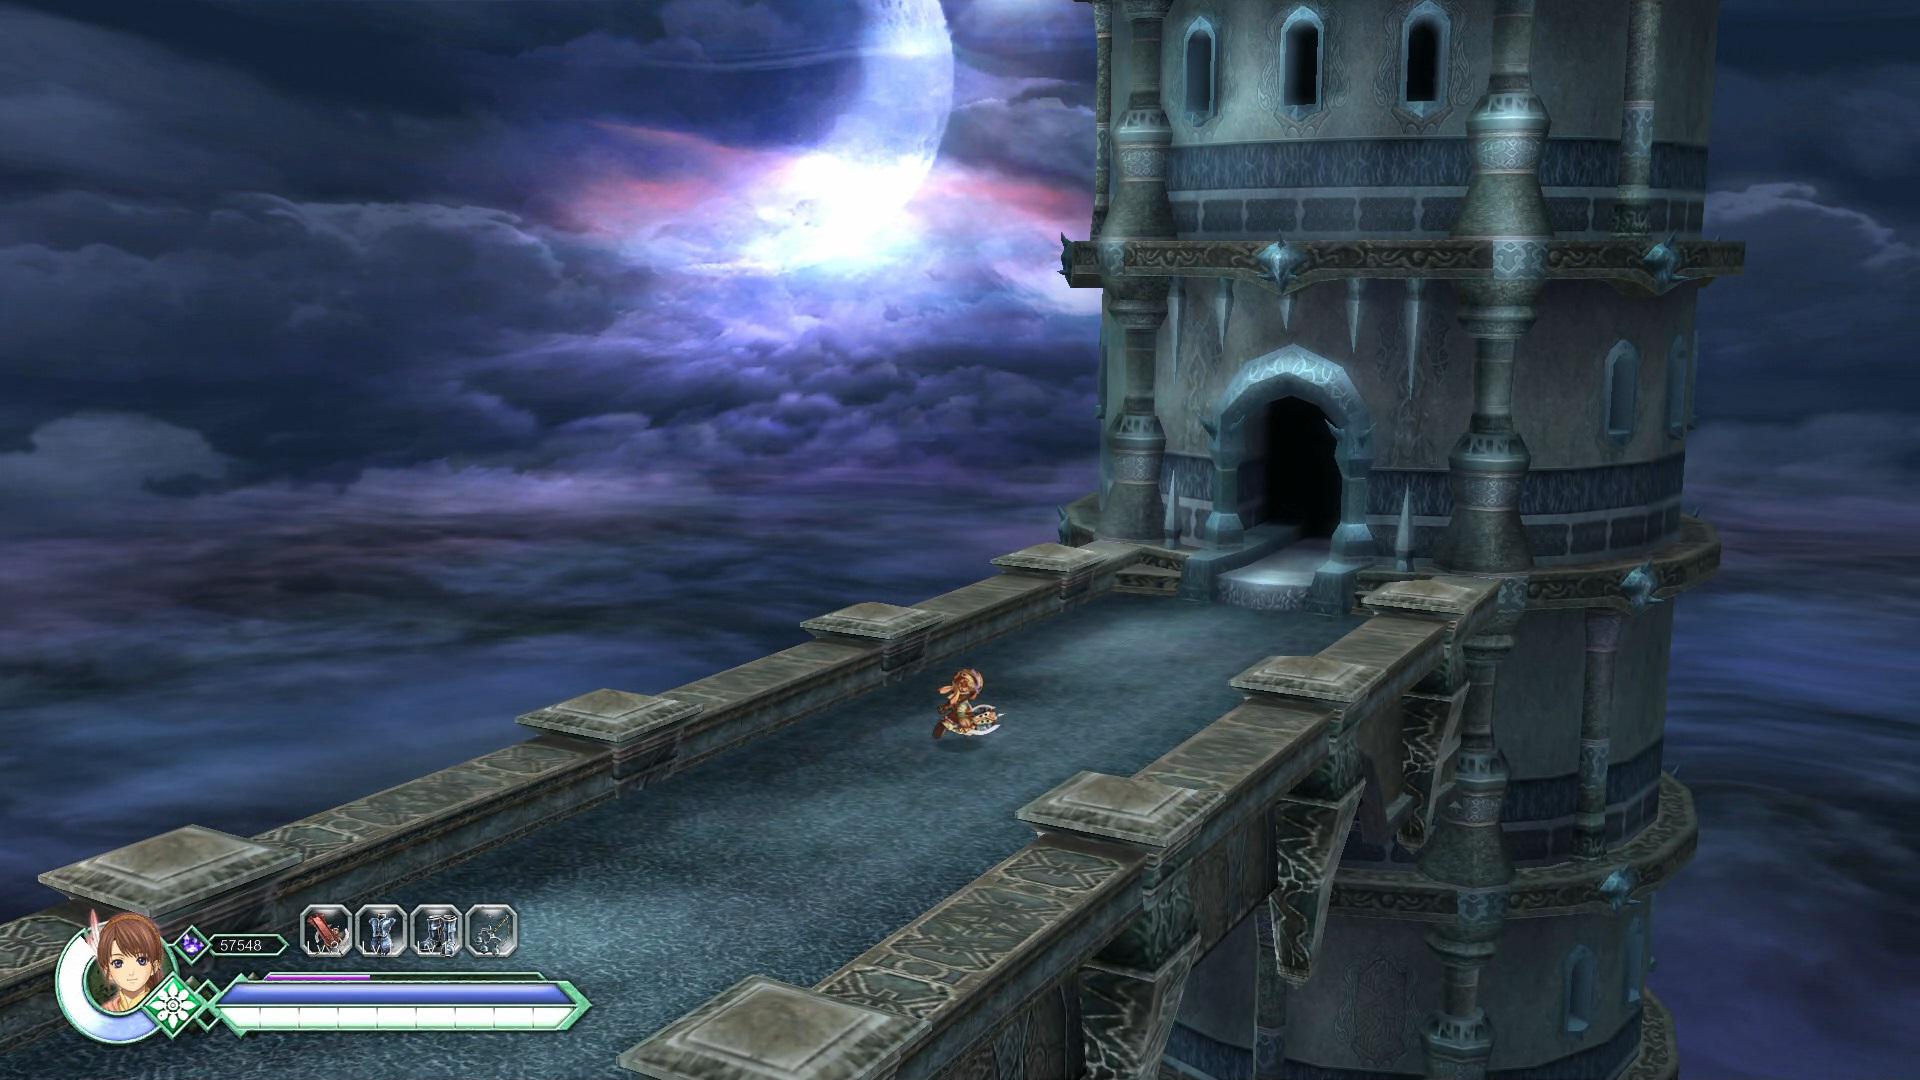 『Ys Origin』ゲーム画面